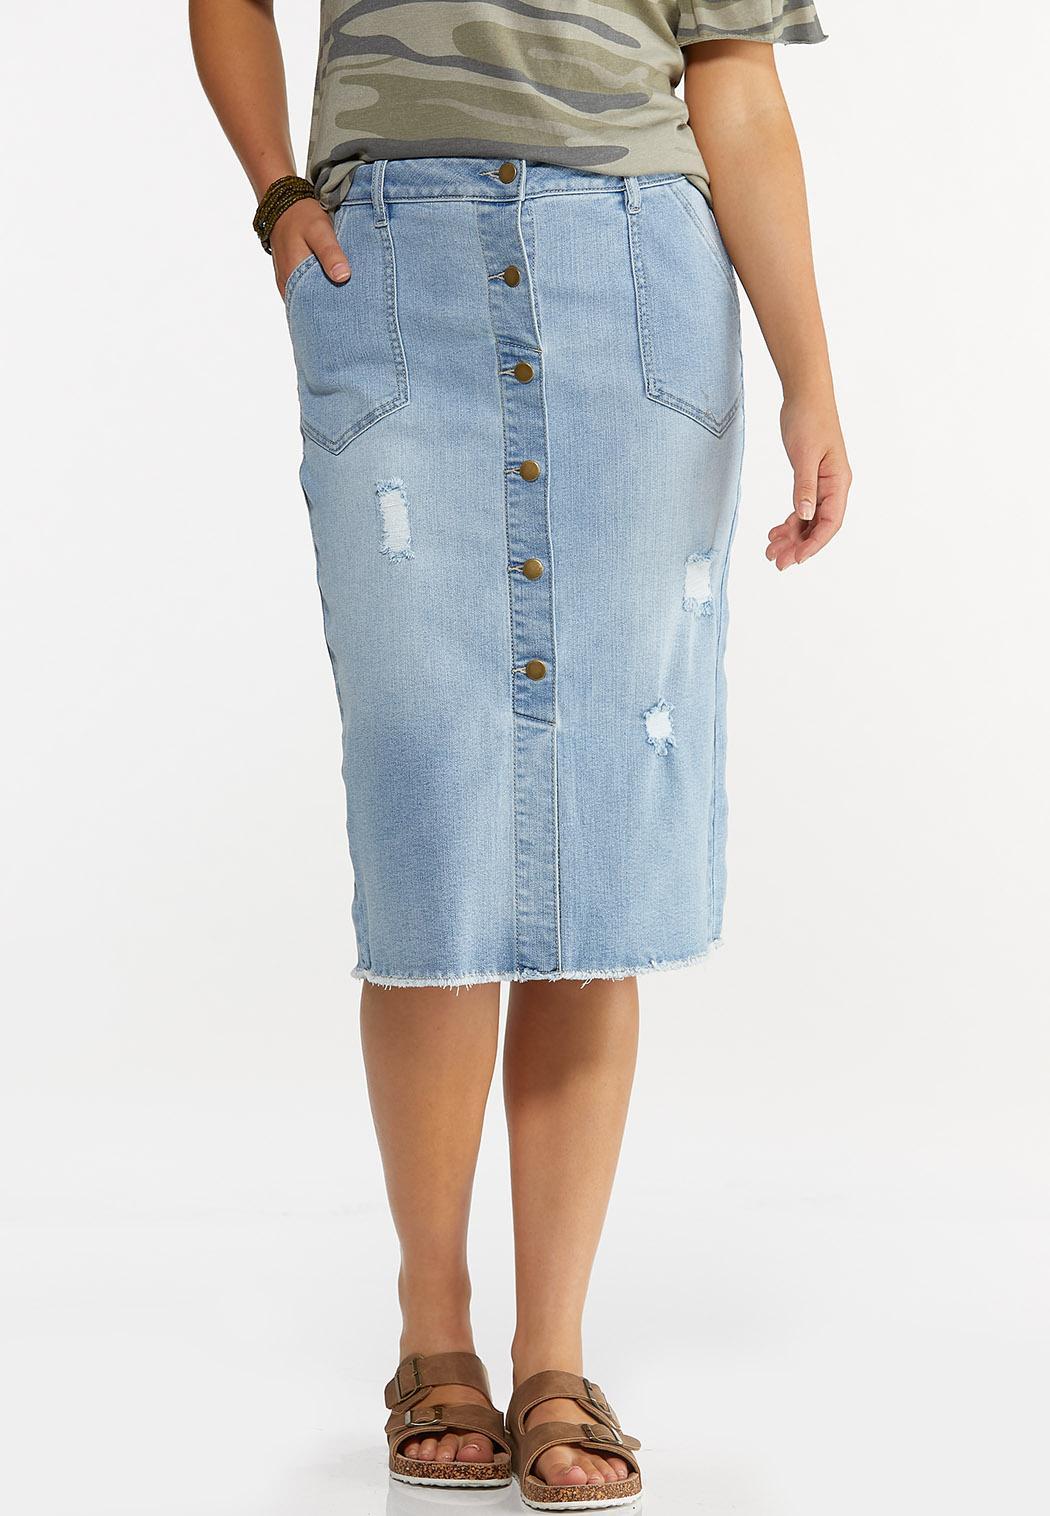 Distressed Button Front Denim Skirt